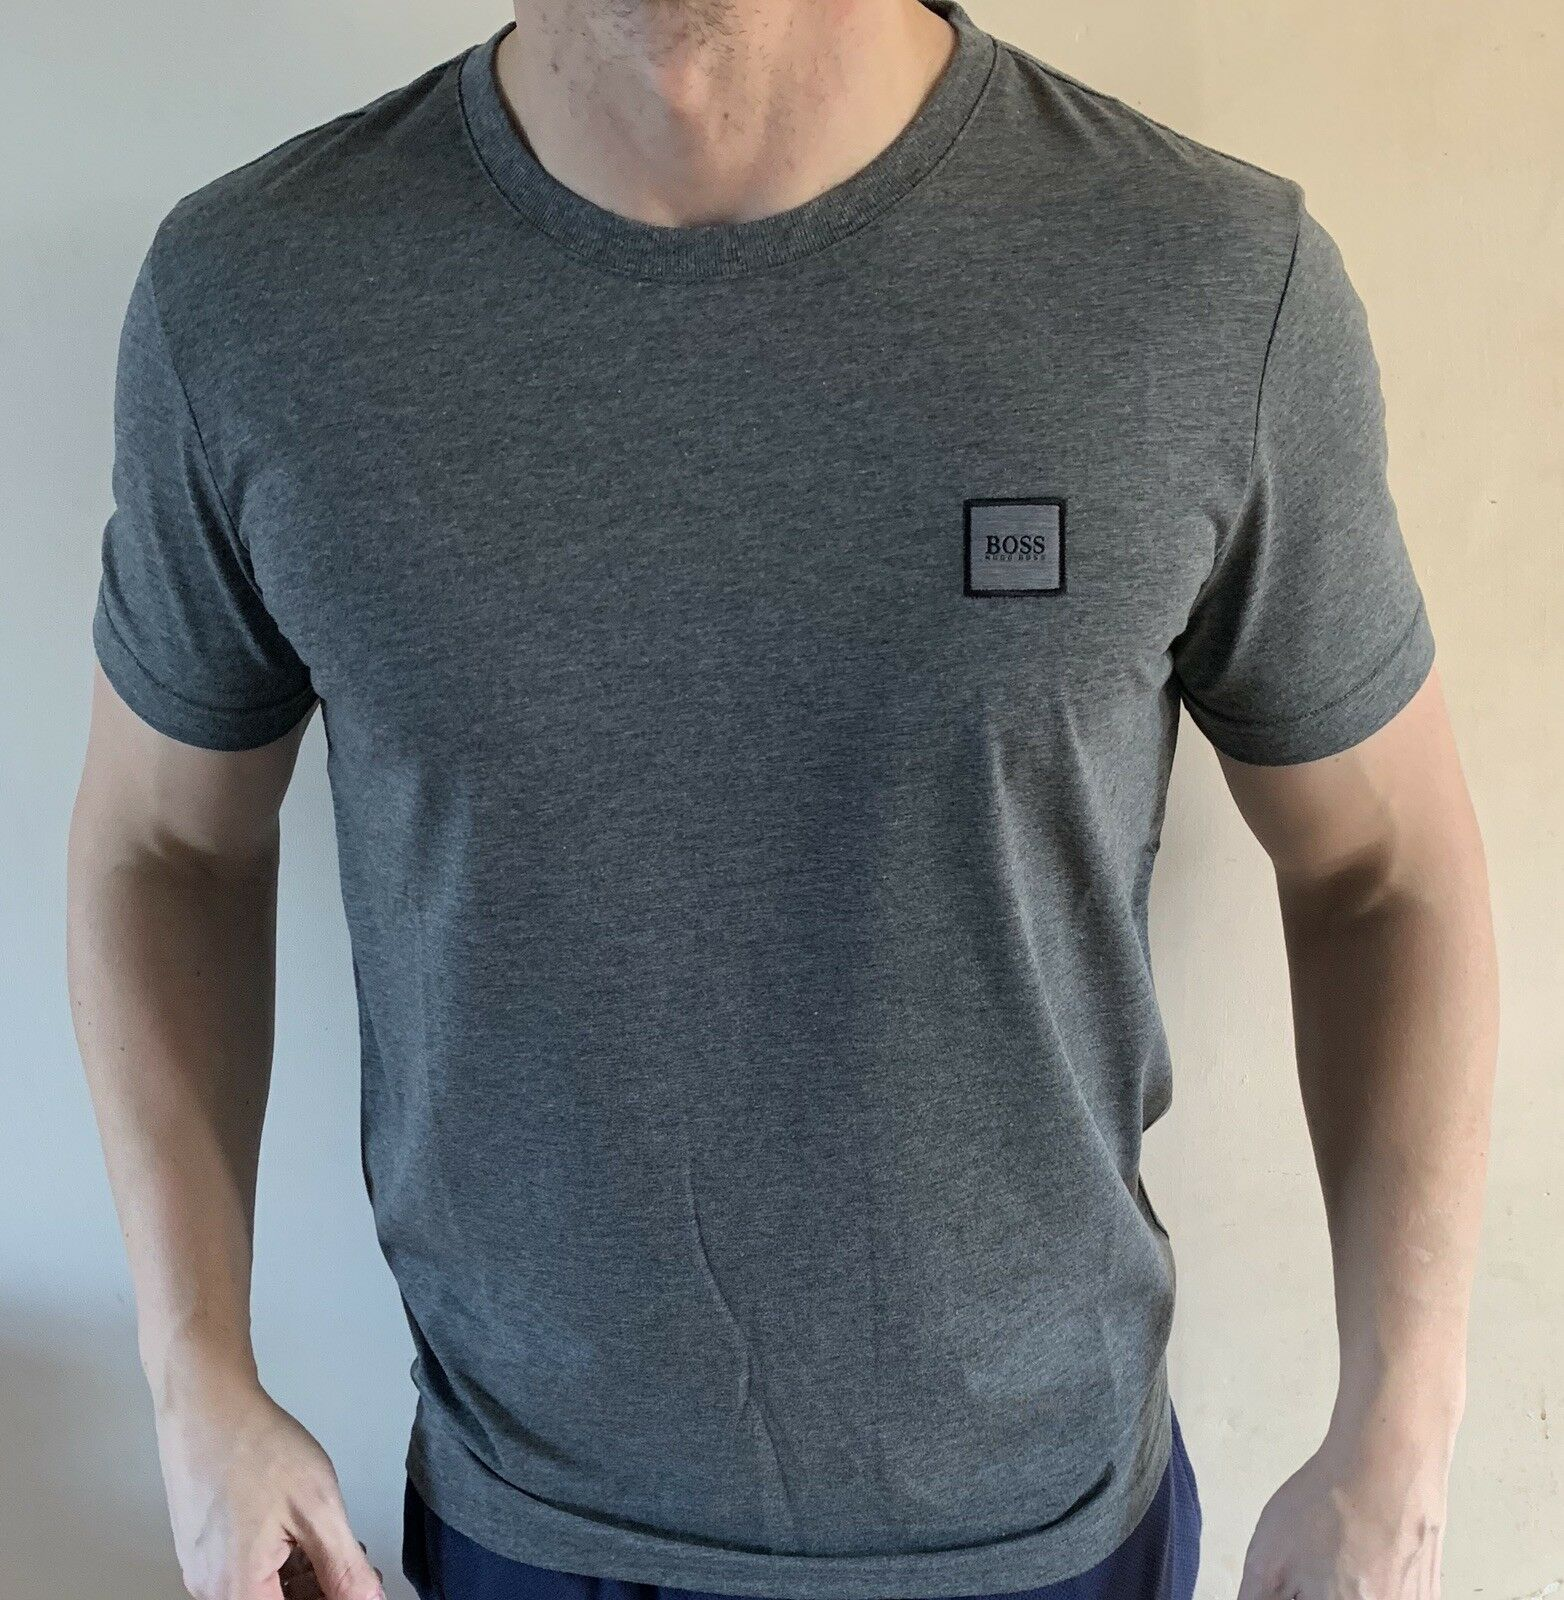 Hugo Boss BOSS T-shirt Top size Large BNWT Dark Grey NEW